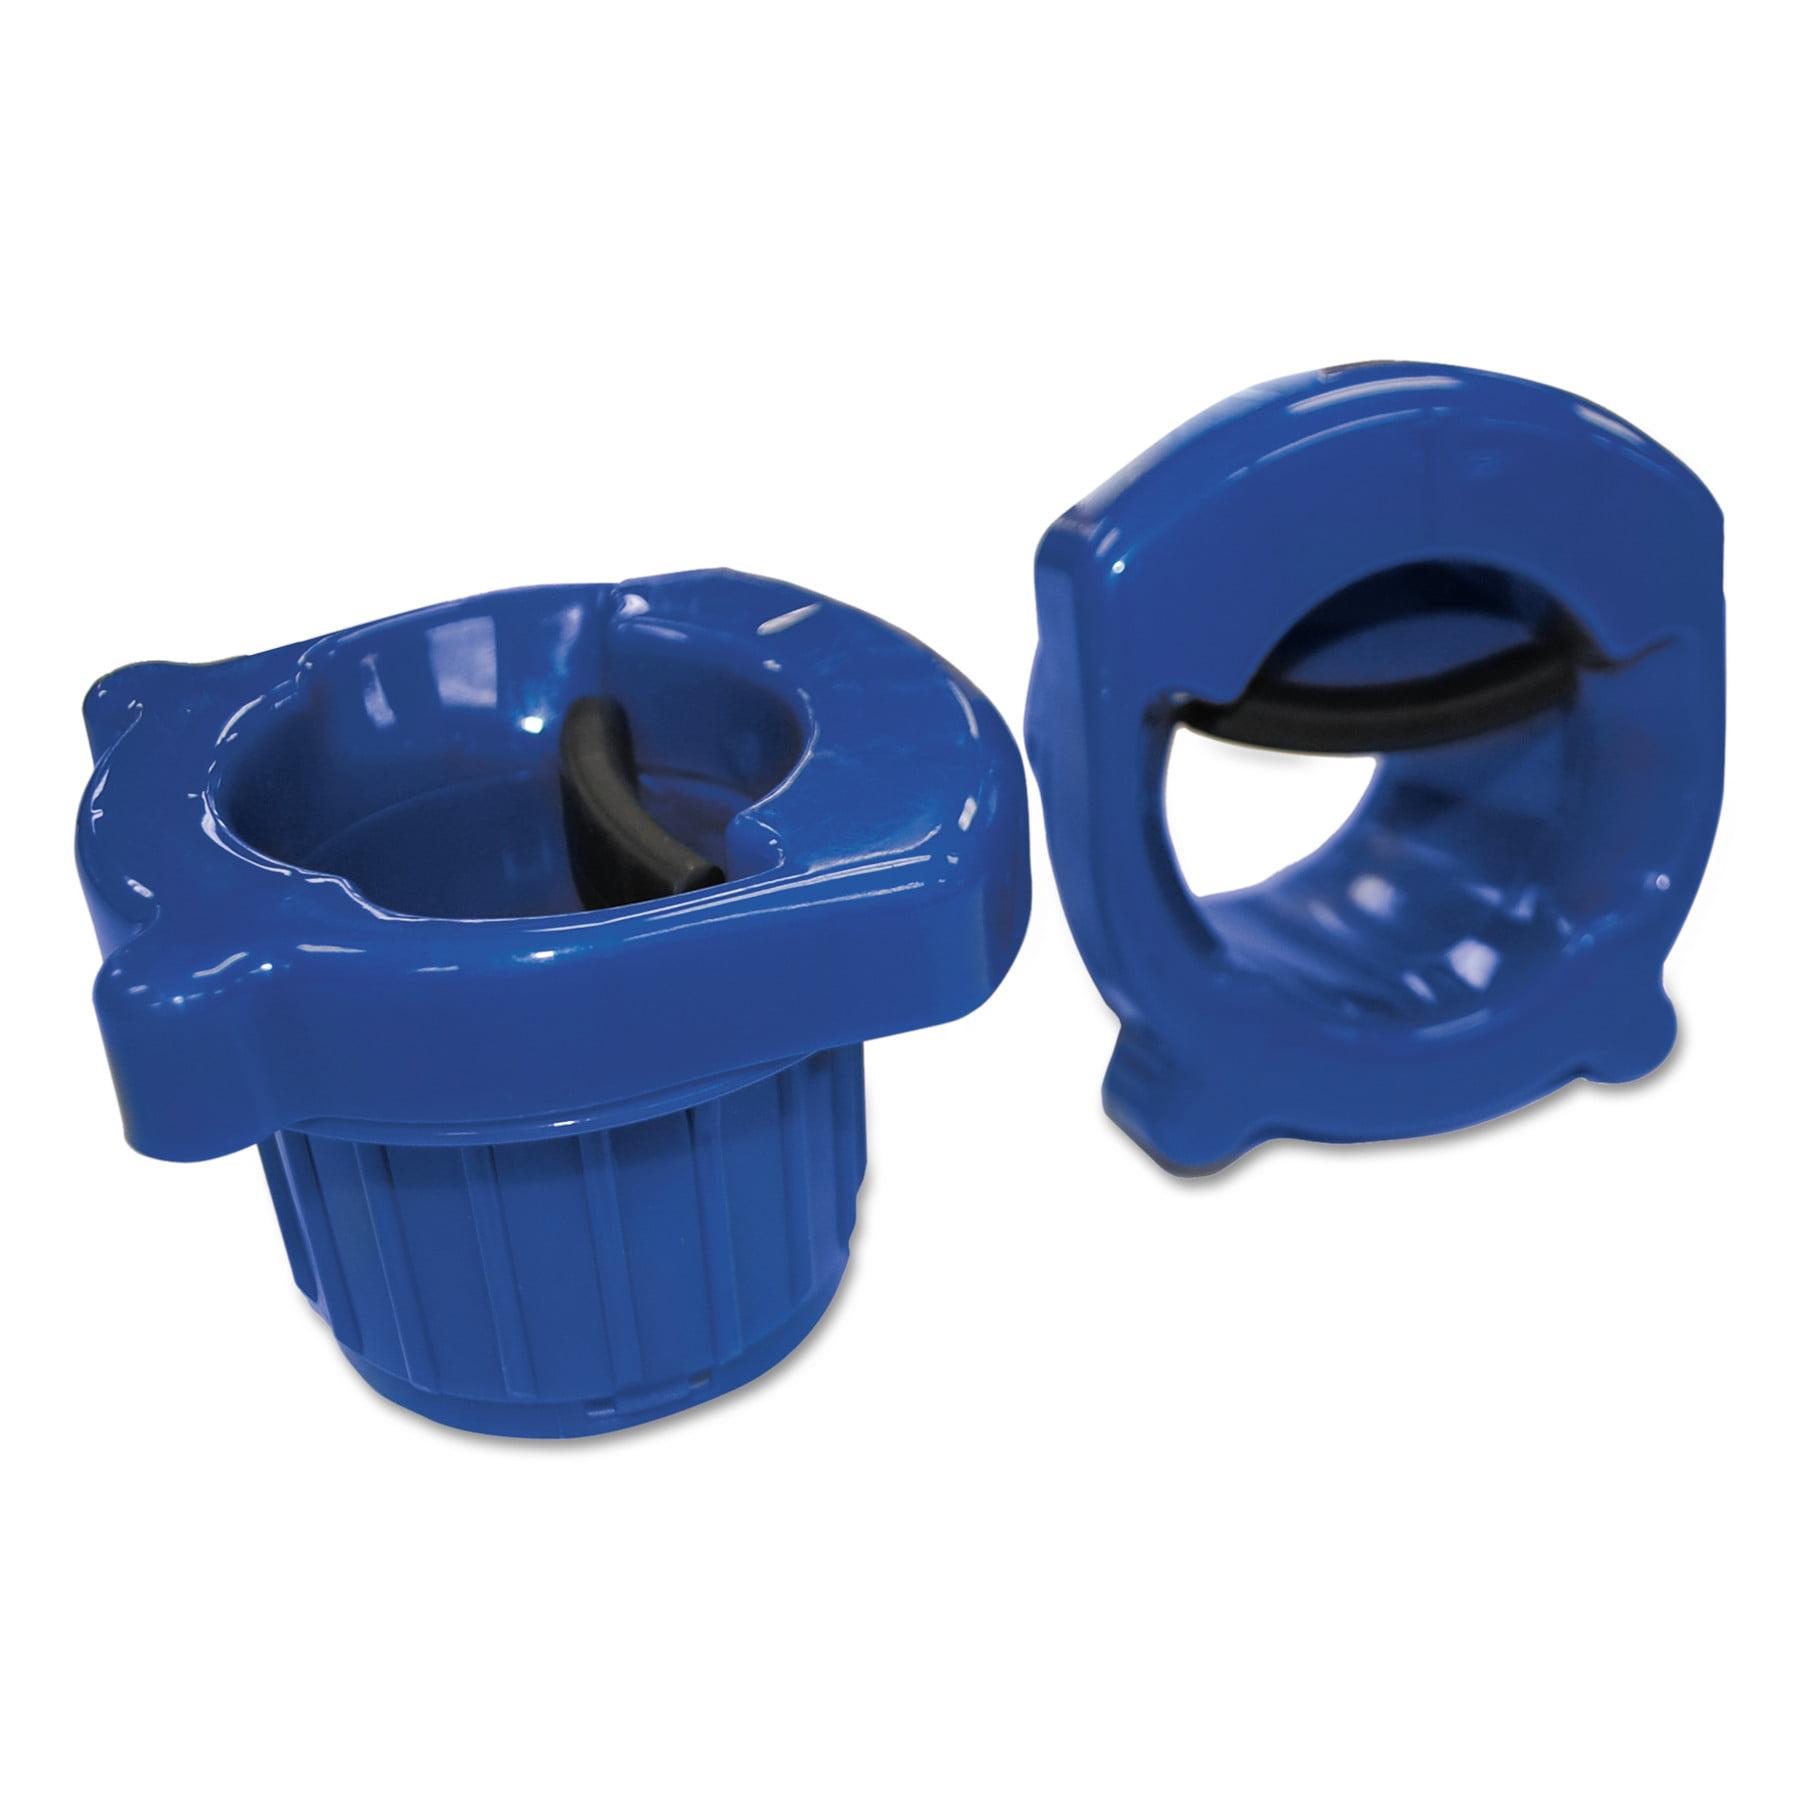 "General Supply Hand Core Dispenser for Stretch Film Rolls 12"" to 18"" Wide, Blue -UFSCOREDISP1"